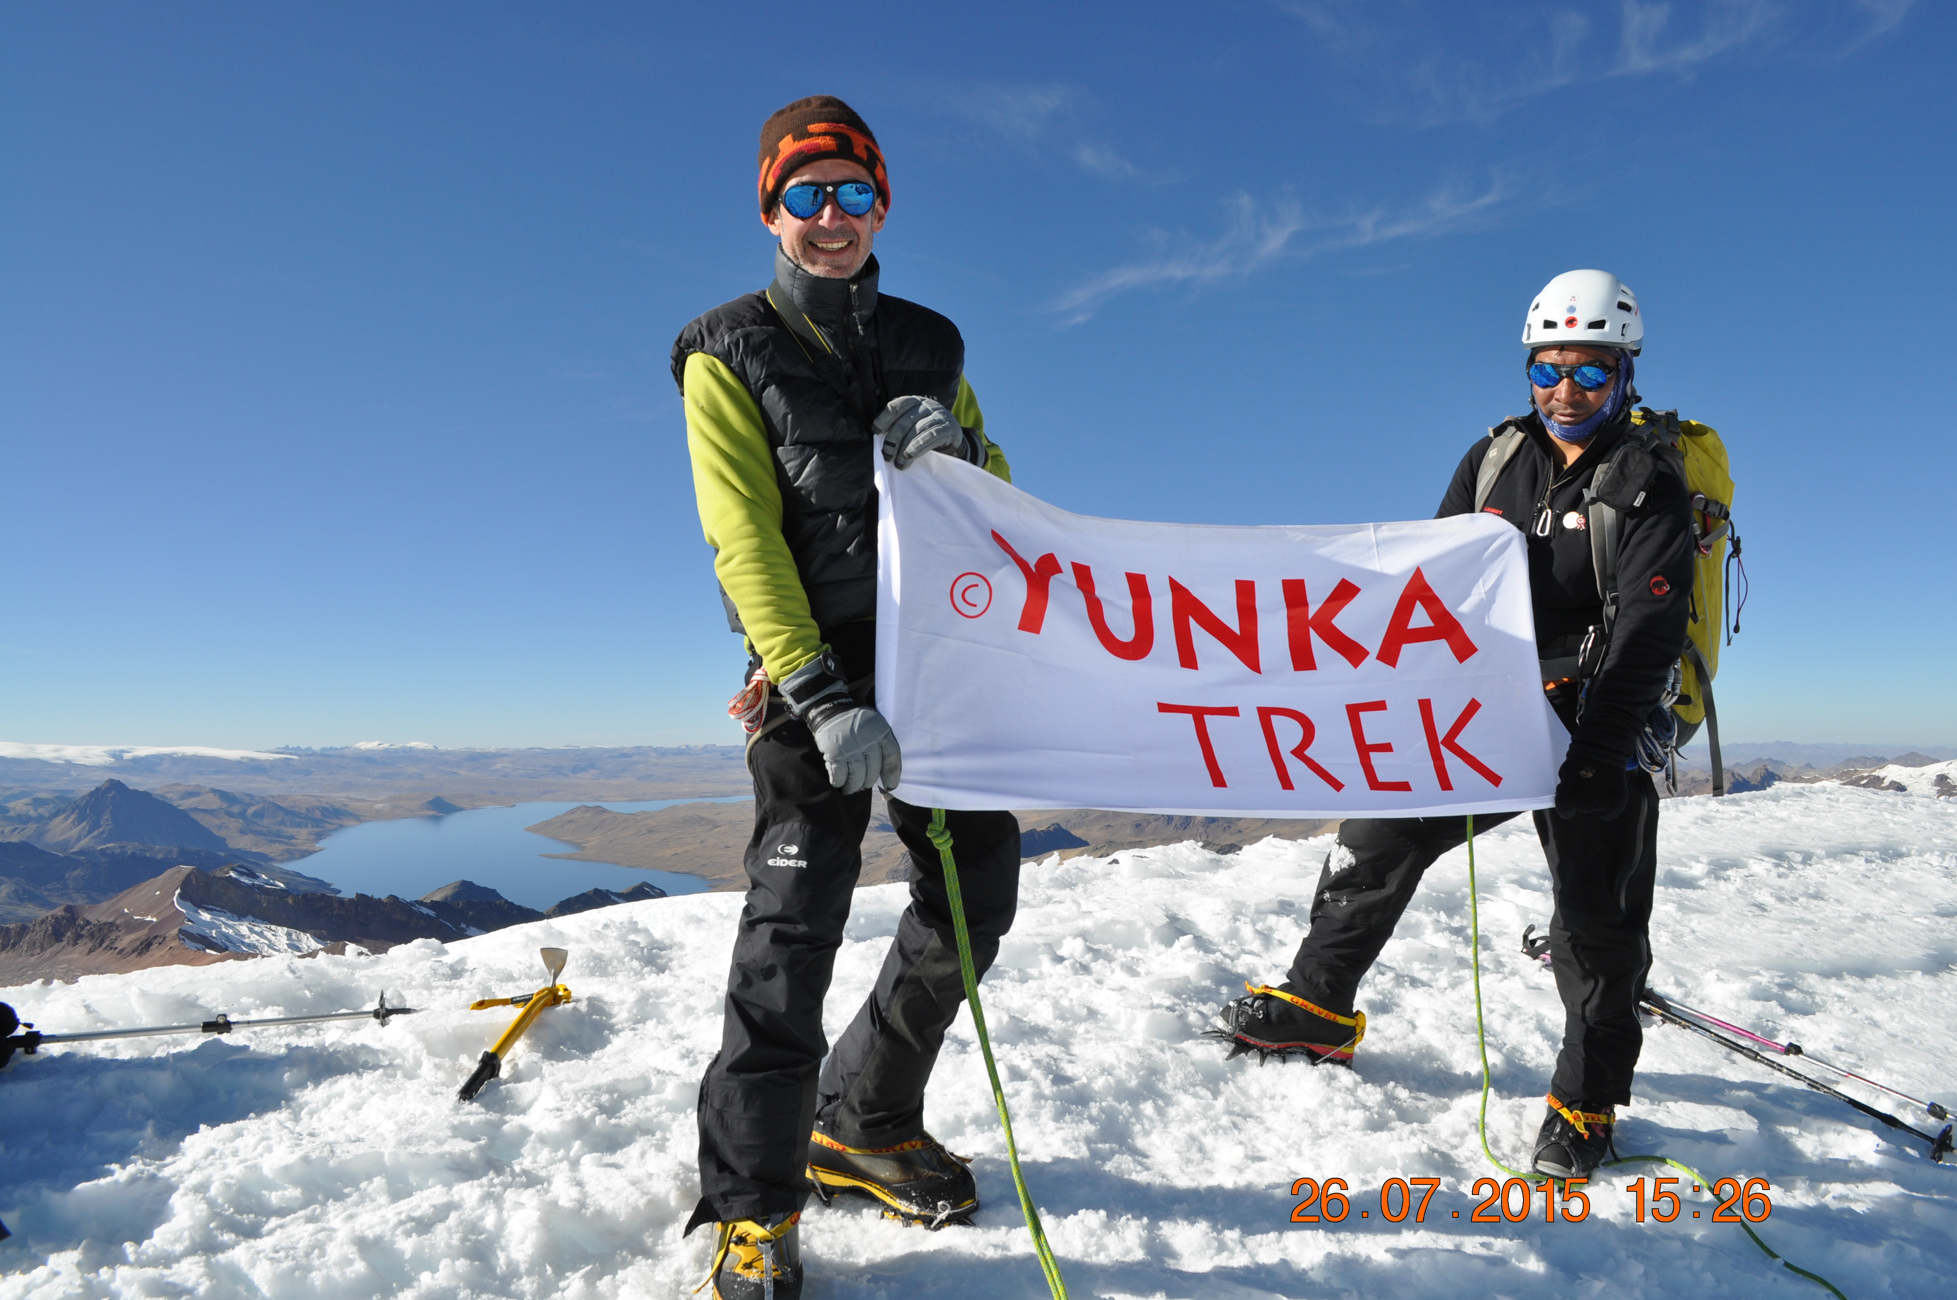 Ascension Yunka Trek